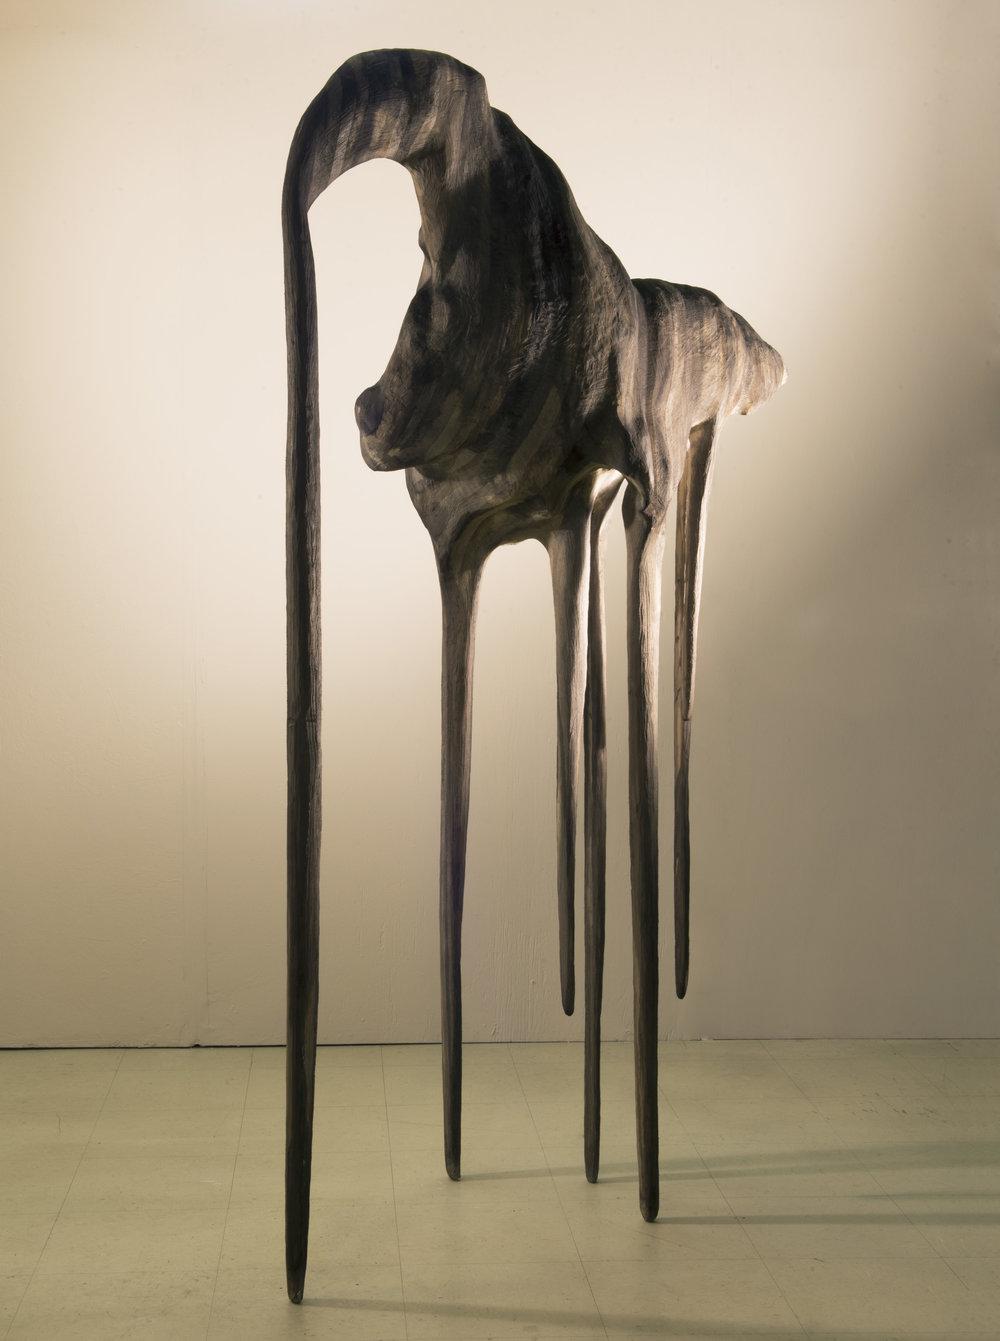 Tracing the haze // A long-legged shadow